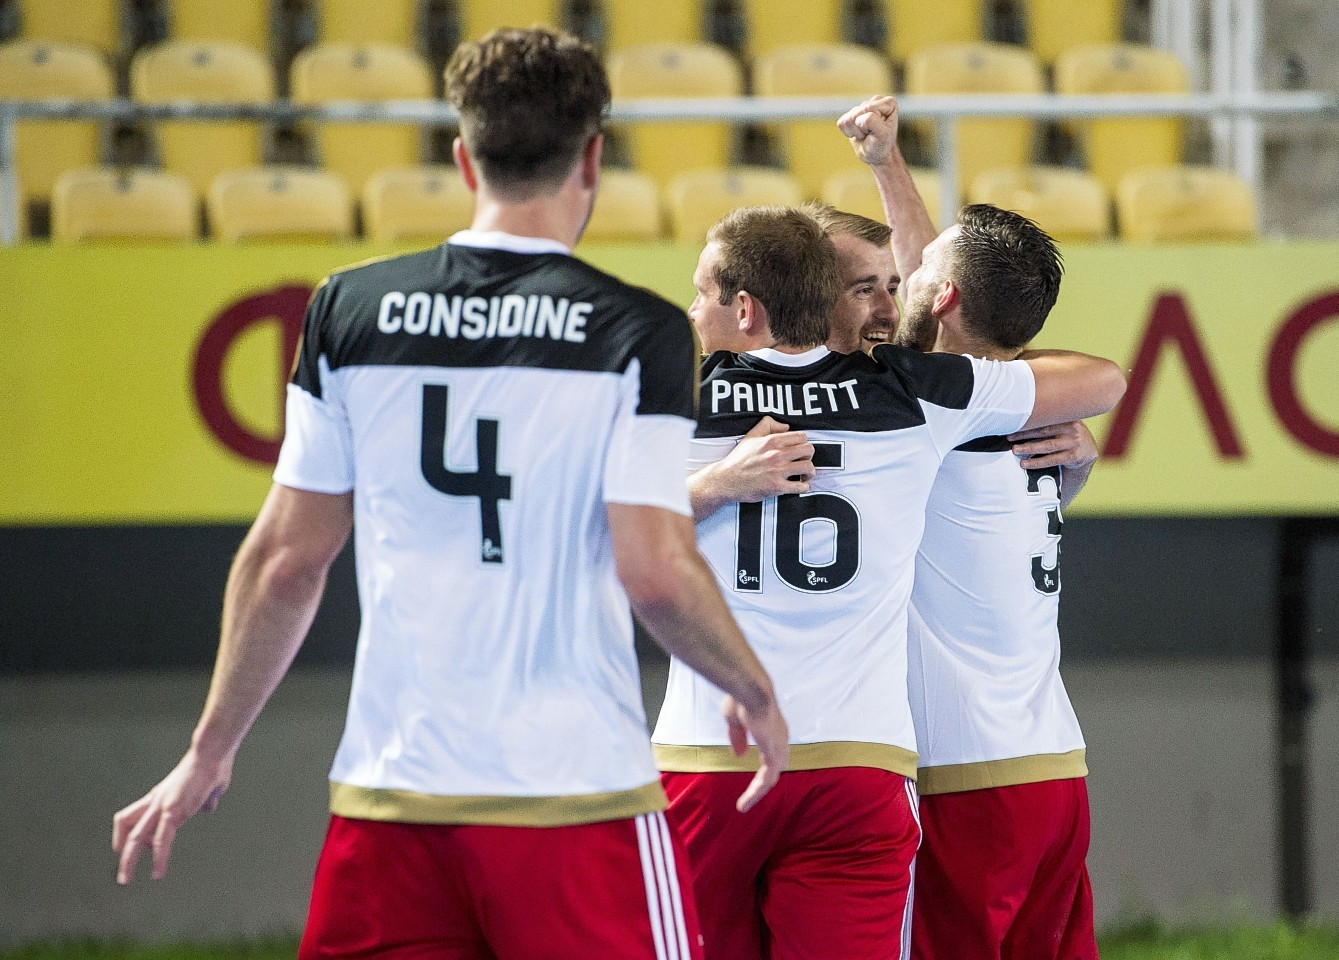 Graeme Shinnie, Peter Pawlett and Andrew Considine congratulate McGinn on his goal